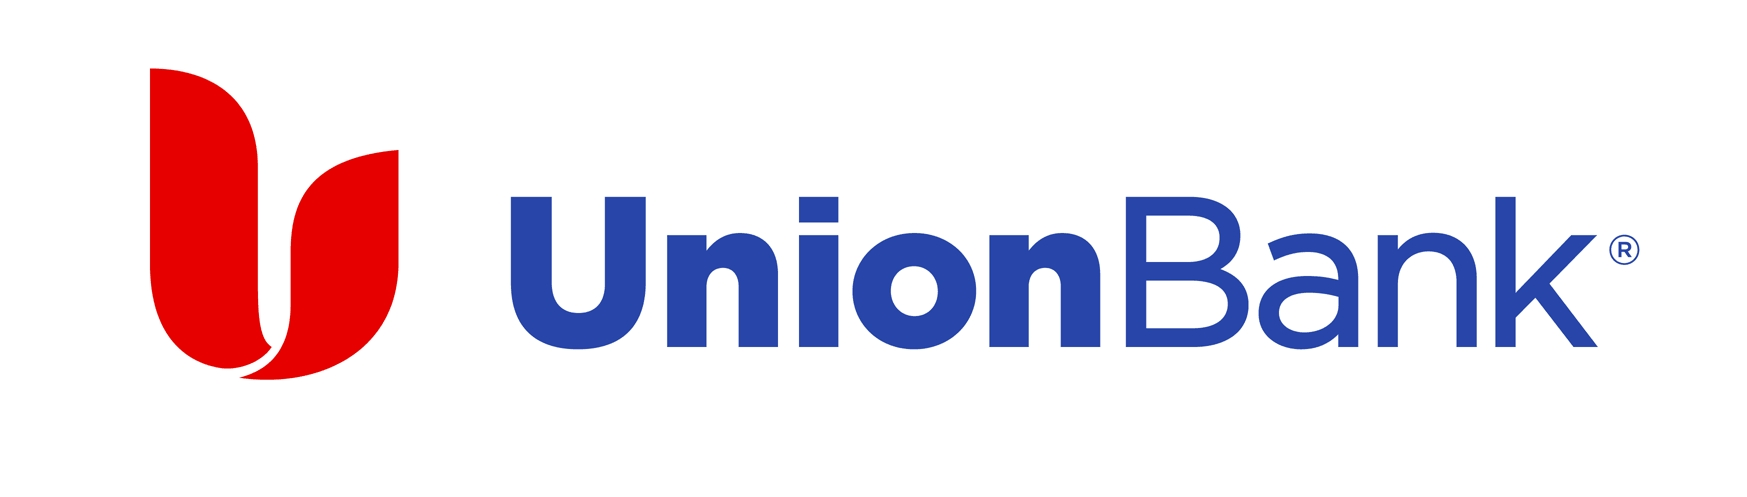 Union Bank Foundation